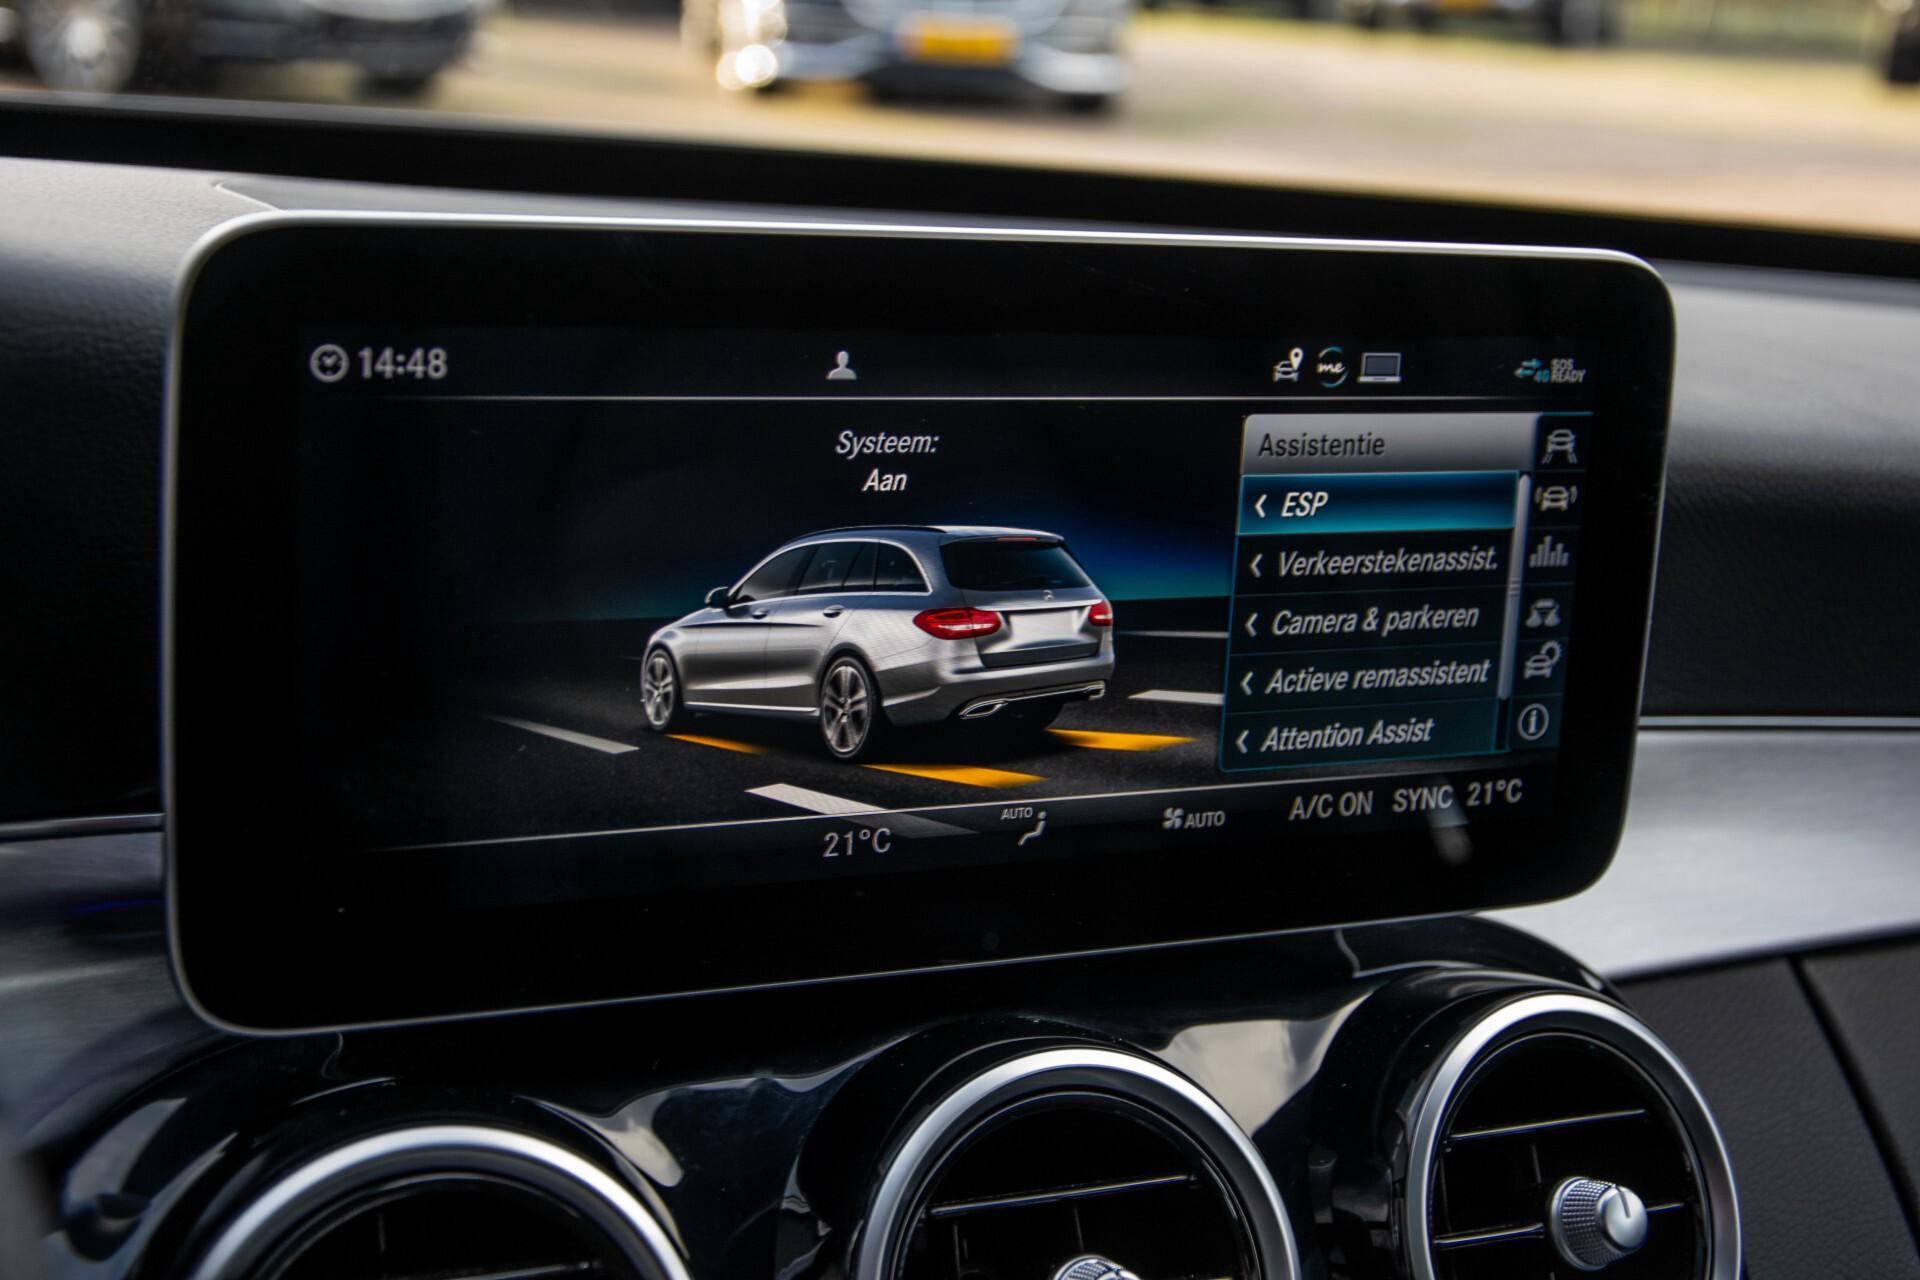 Mercedes-Benz C-Klasse Estate 220 d AMG Panorama/Assistentiepakket/Wegkl-trekhaak/DAB/Ambient/Leer/MULTIBEAM Aut9 Foto 34